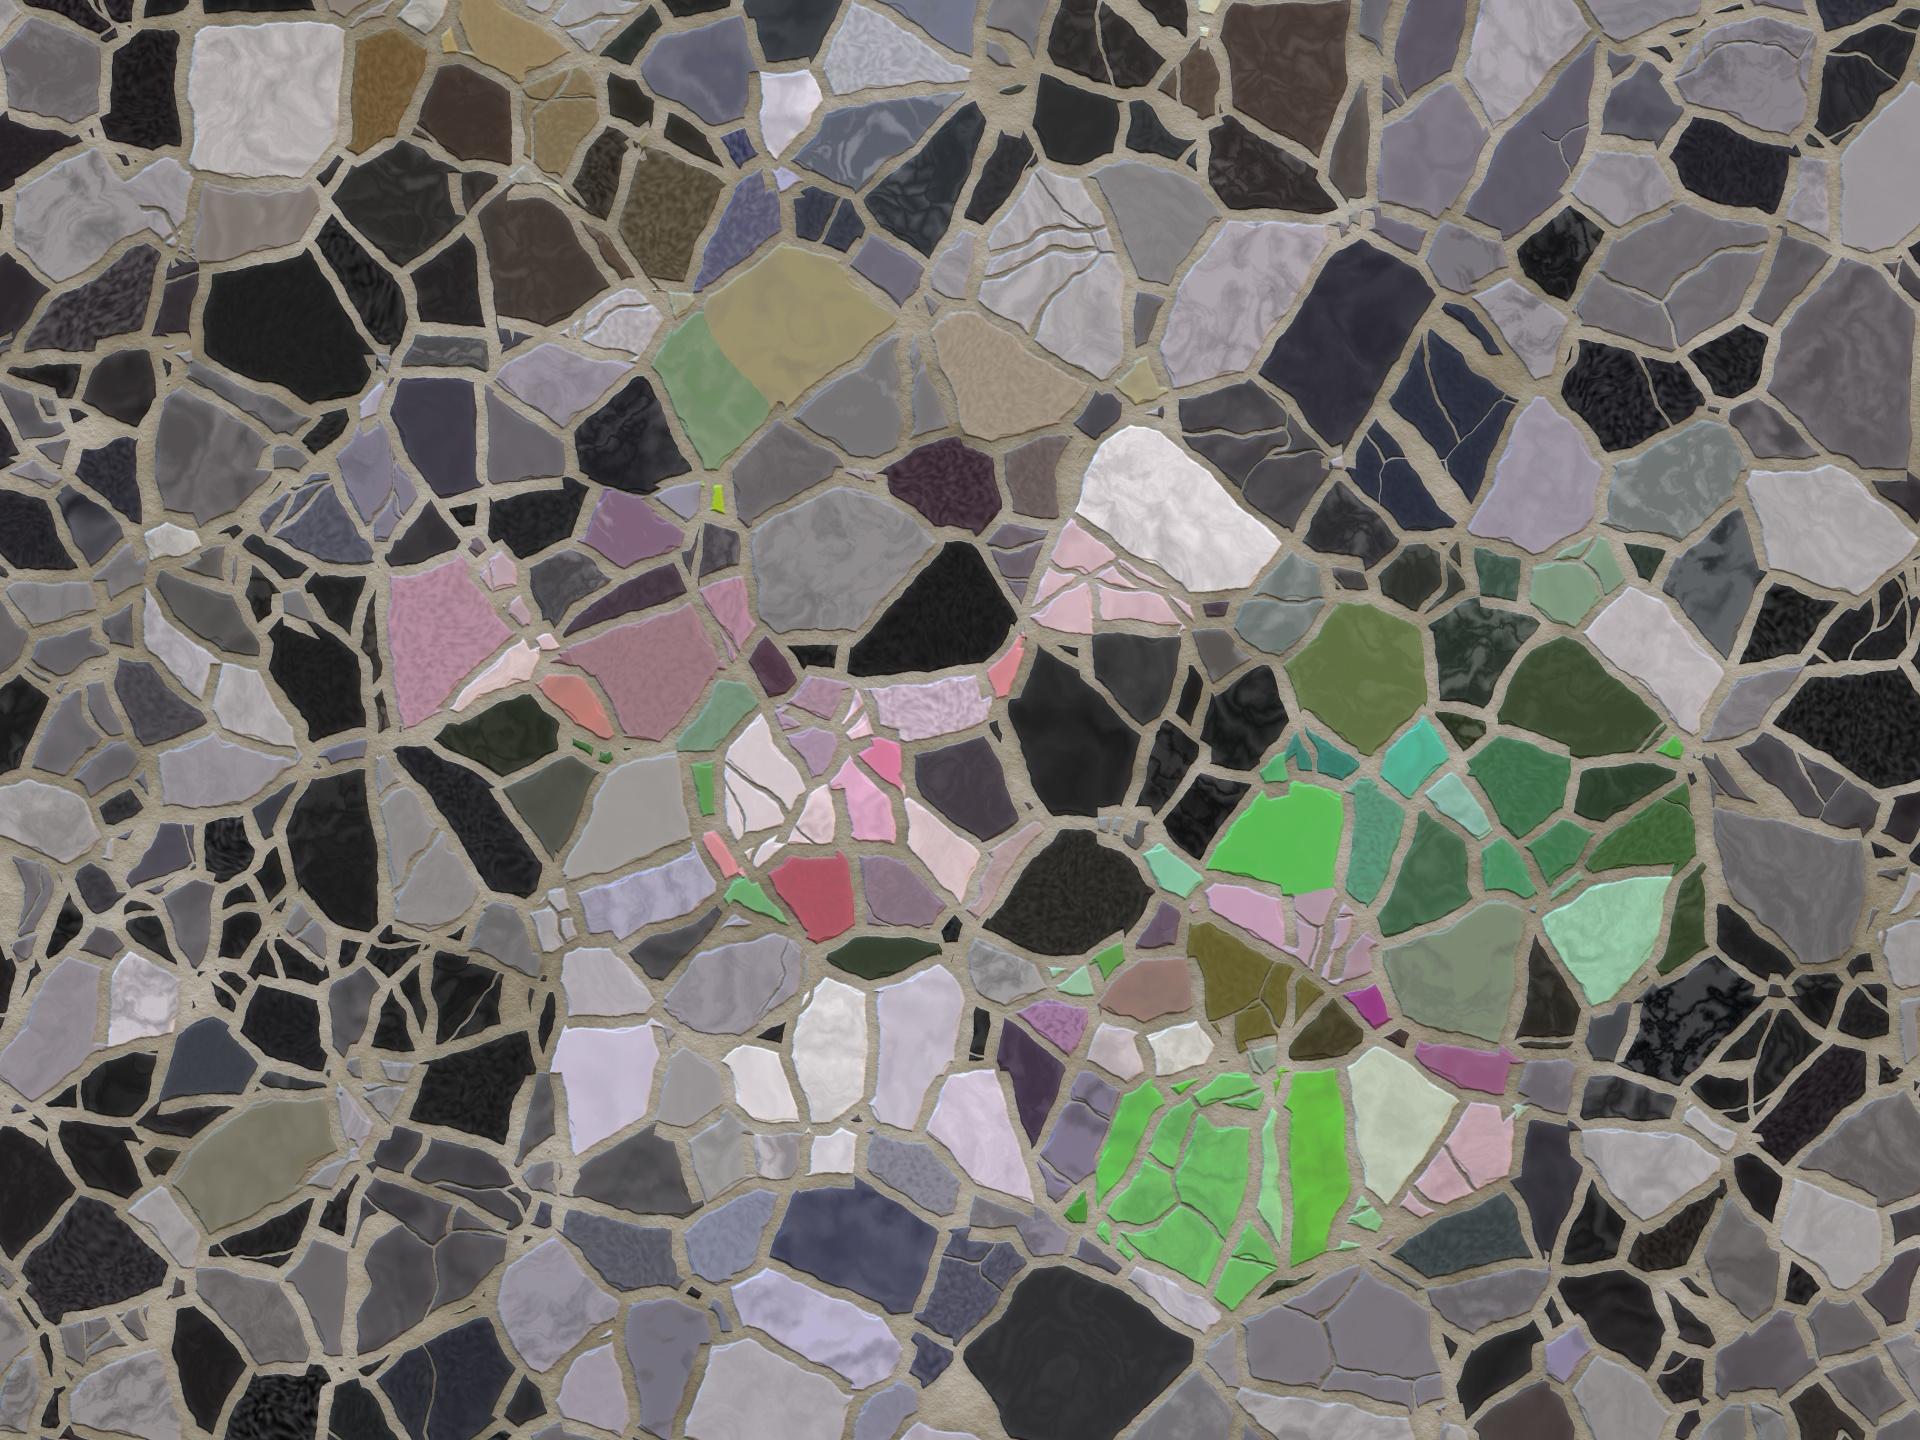 floral mosaic tile free stock photo